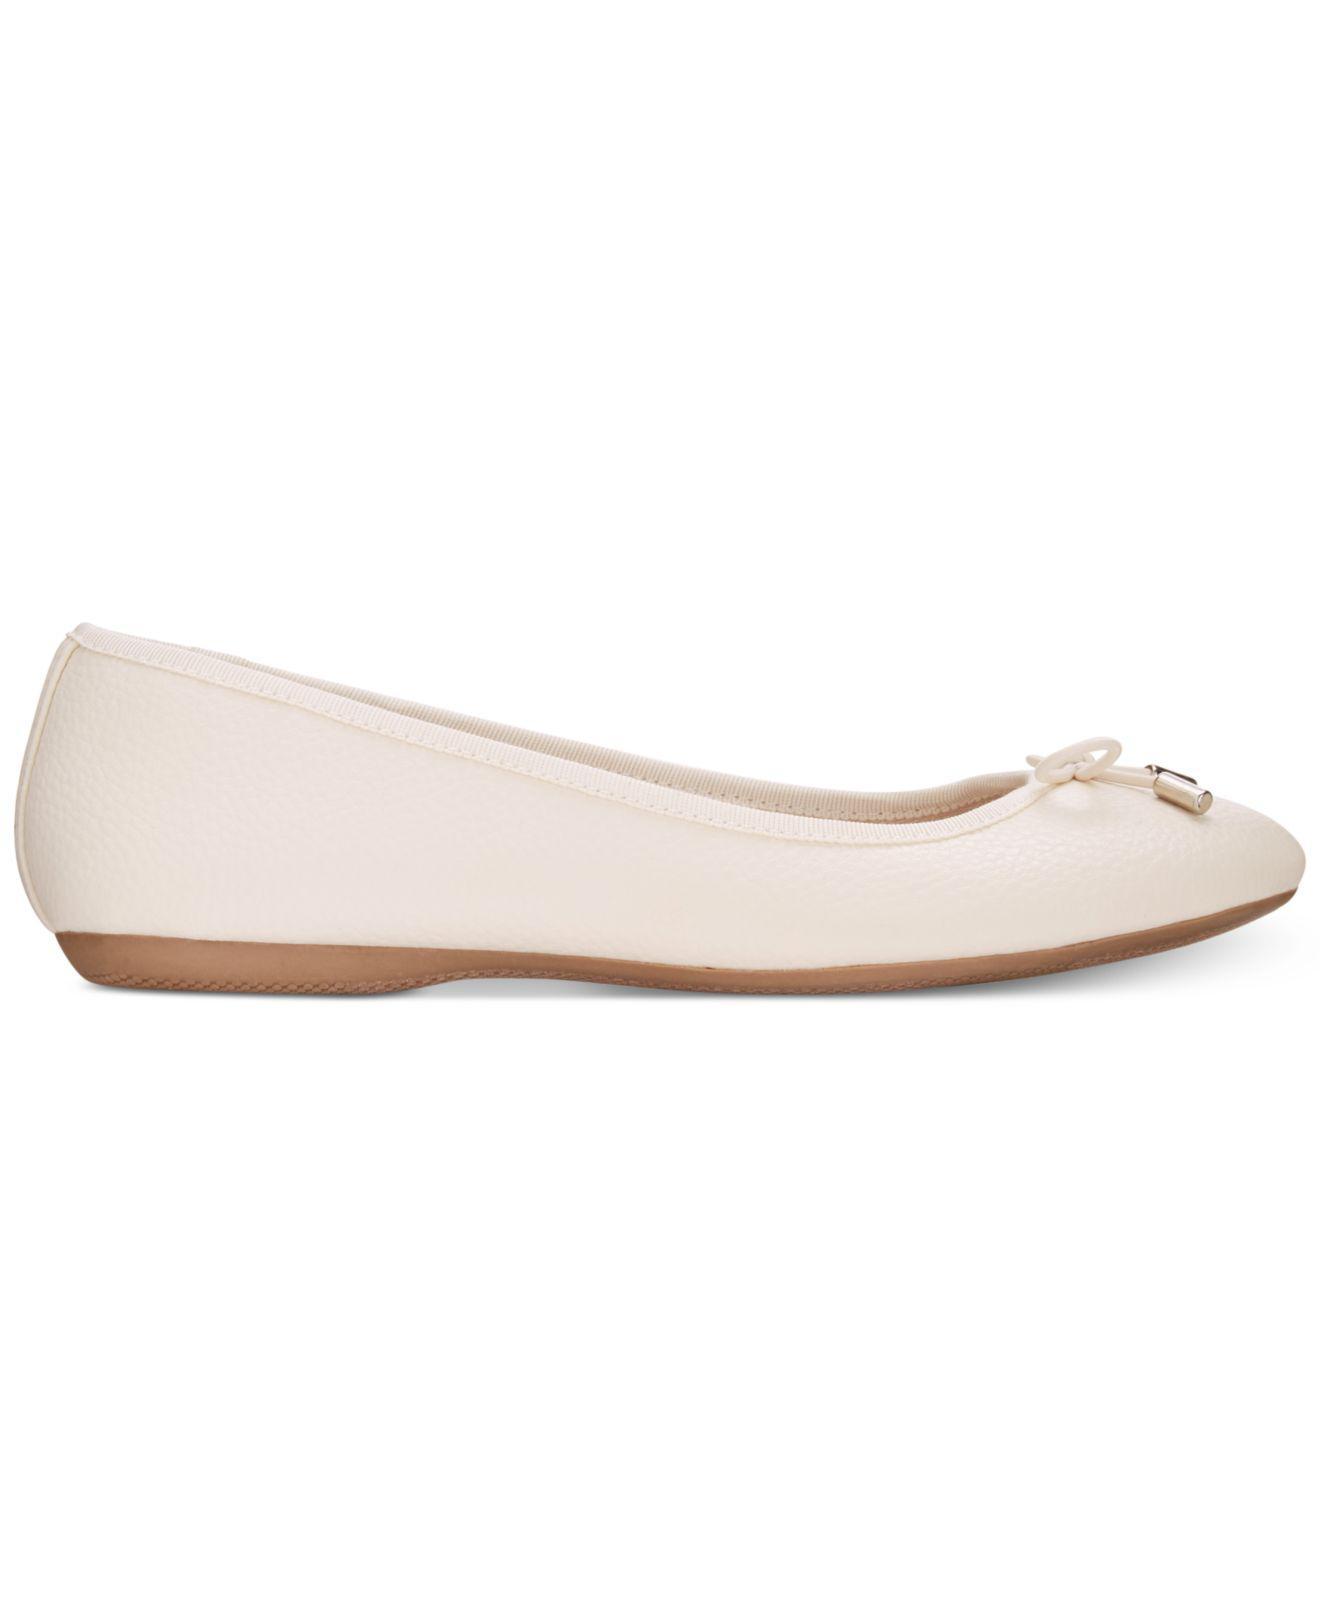 f738d2464544 Lyst - Alfani Women s Aleaa Ballet Flats - Save 67%